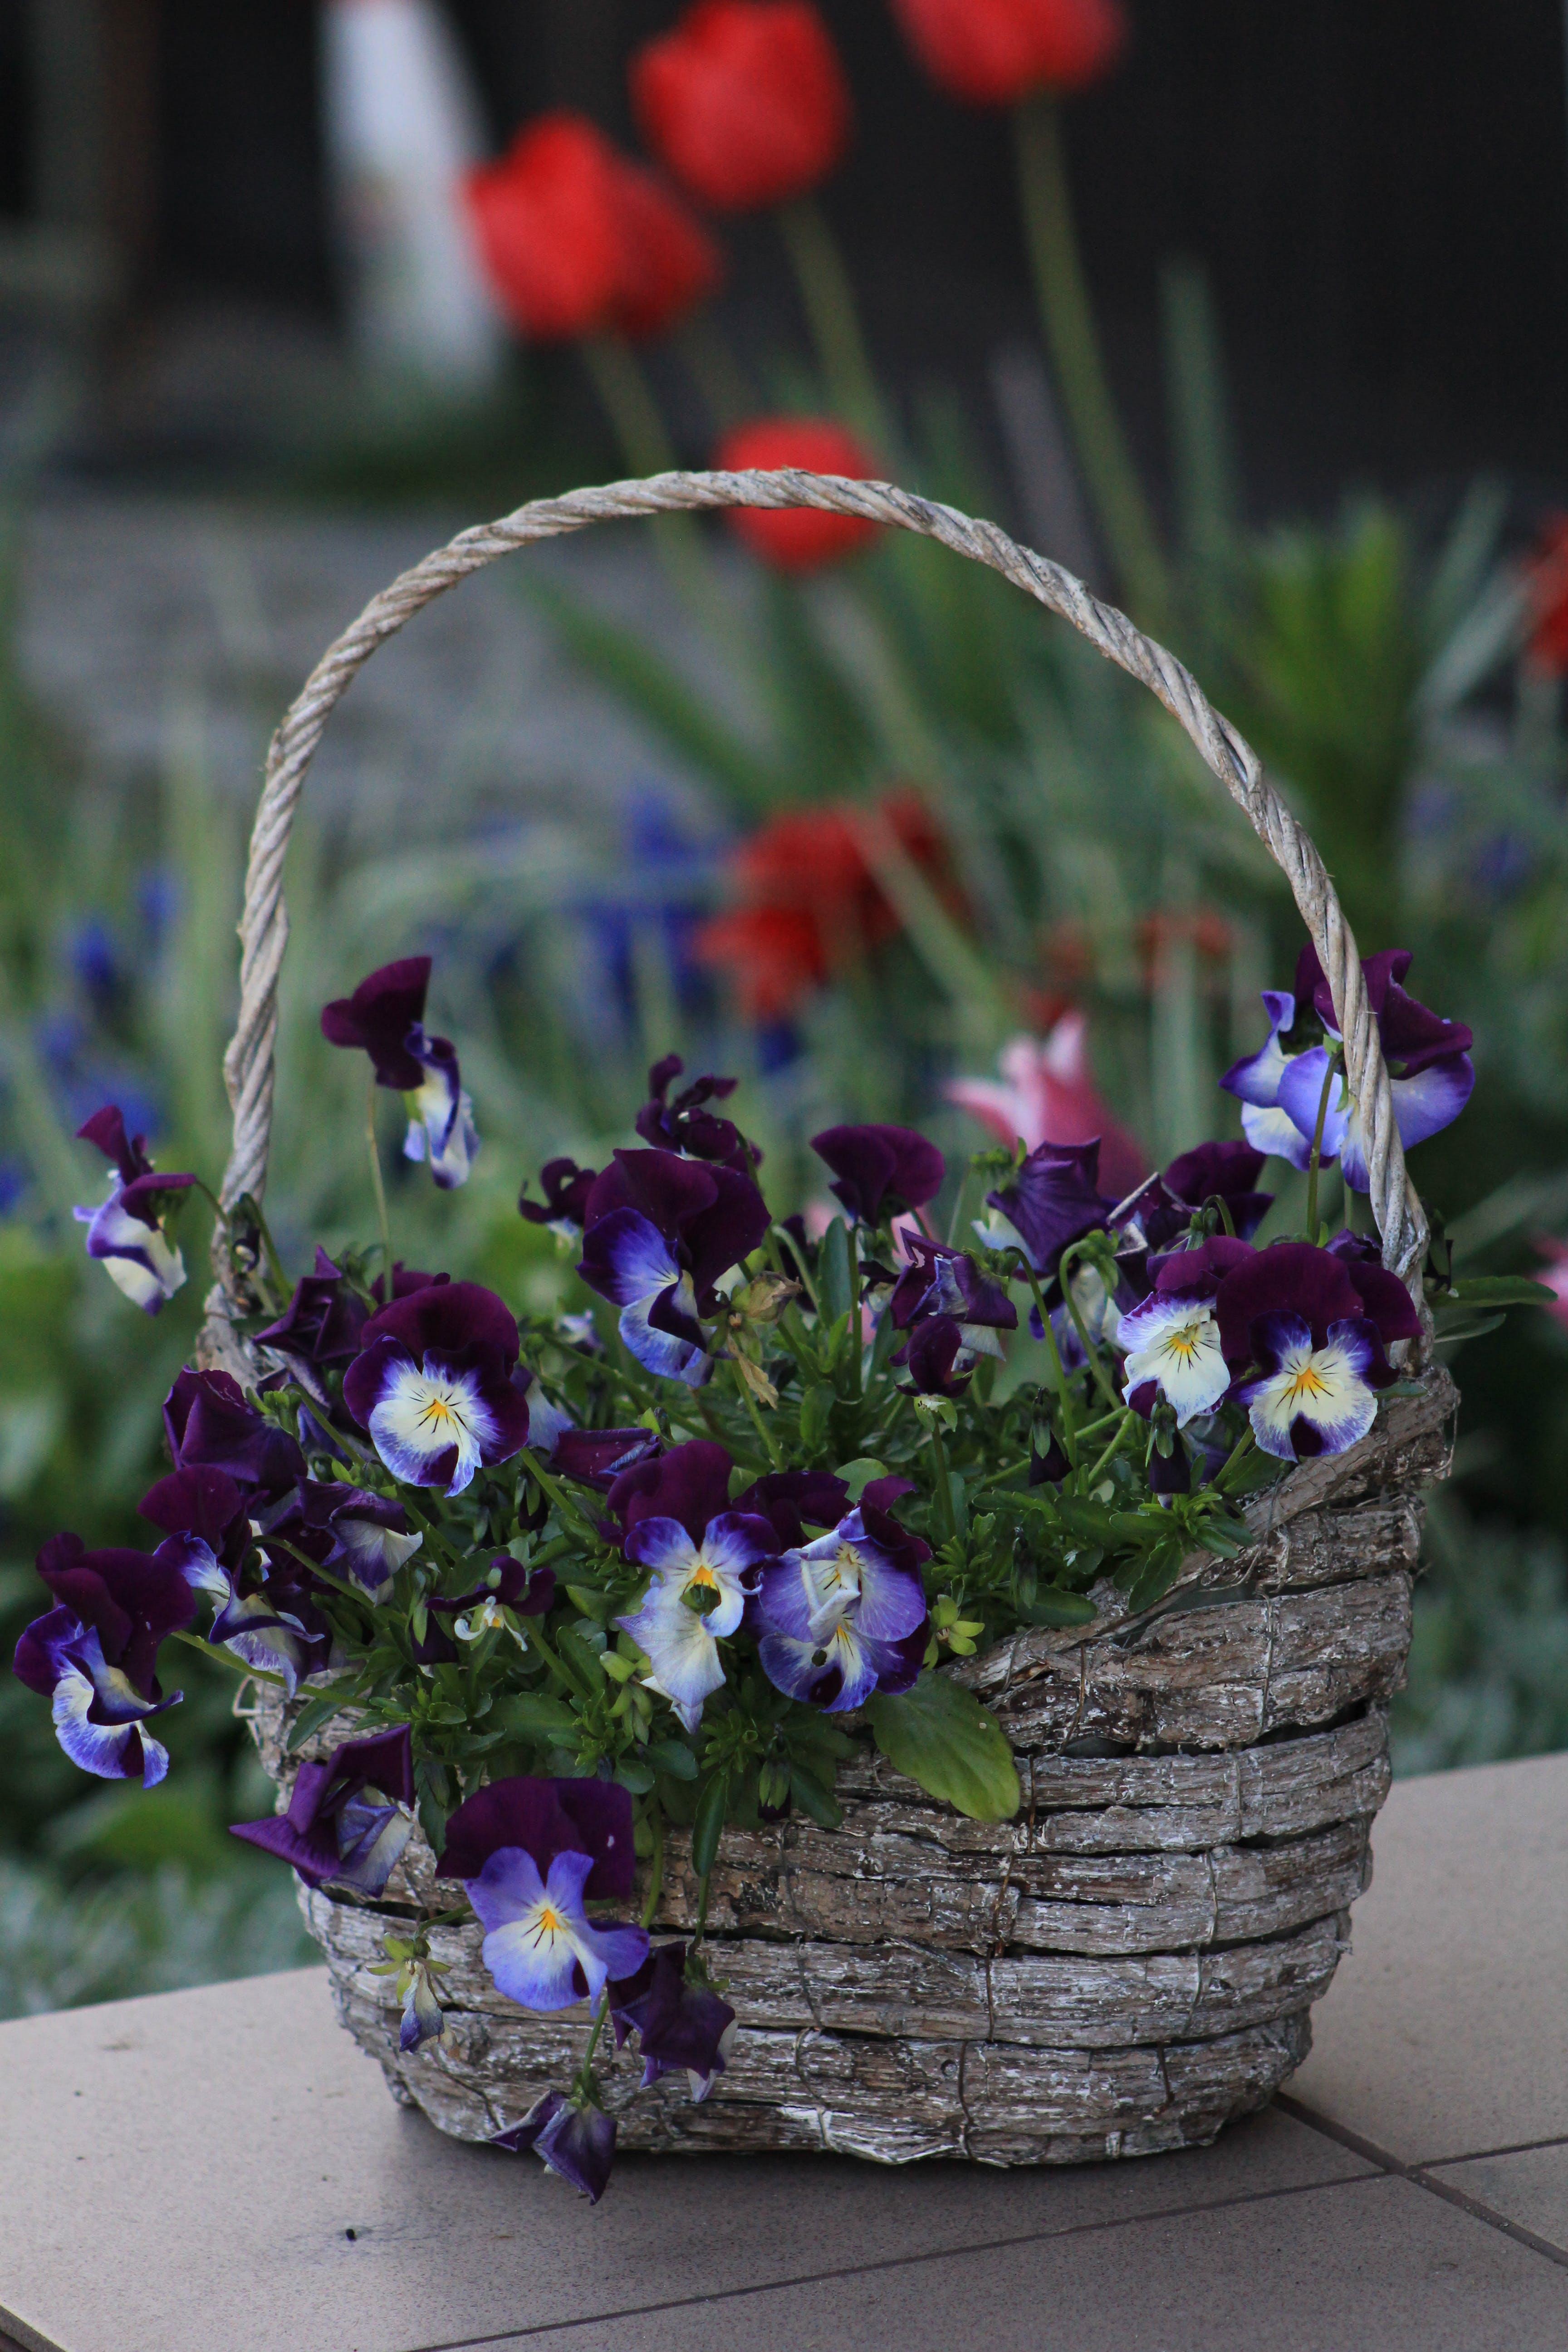 Photo of Violet Flowers On Basket